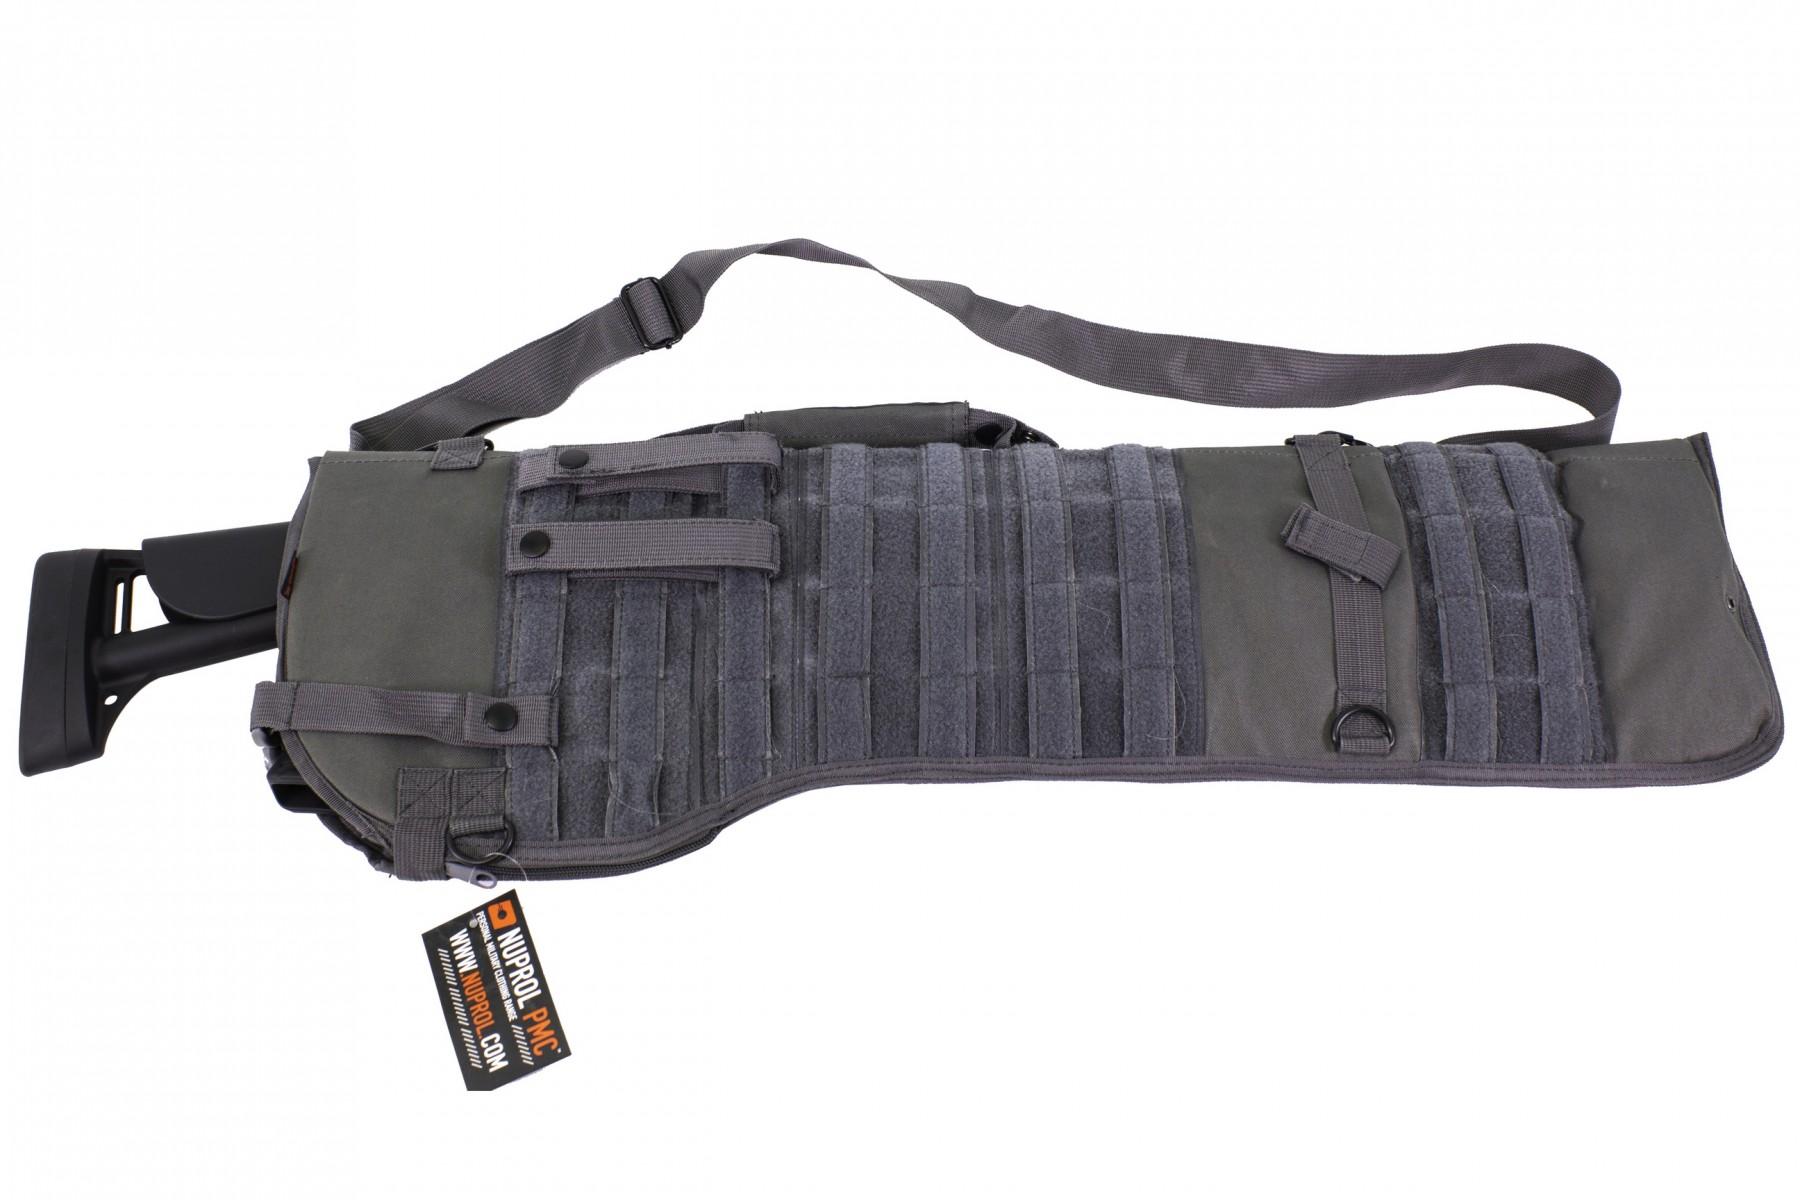 NUPROL PMC SHOTGUN SHEATH product image